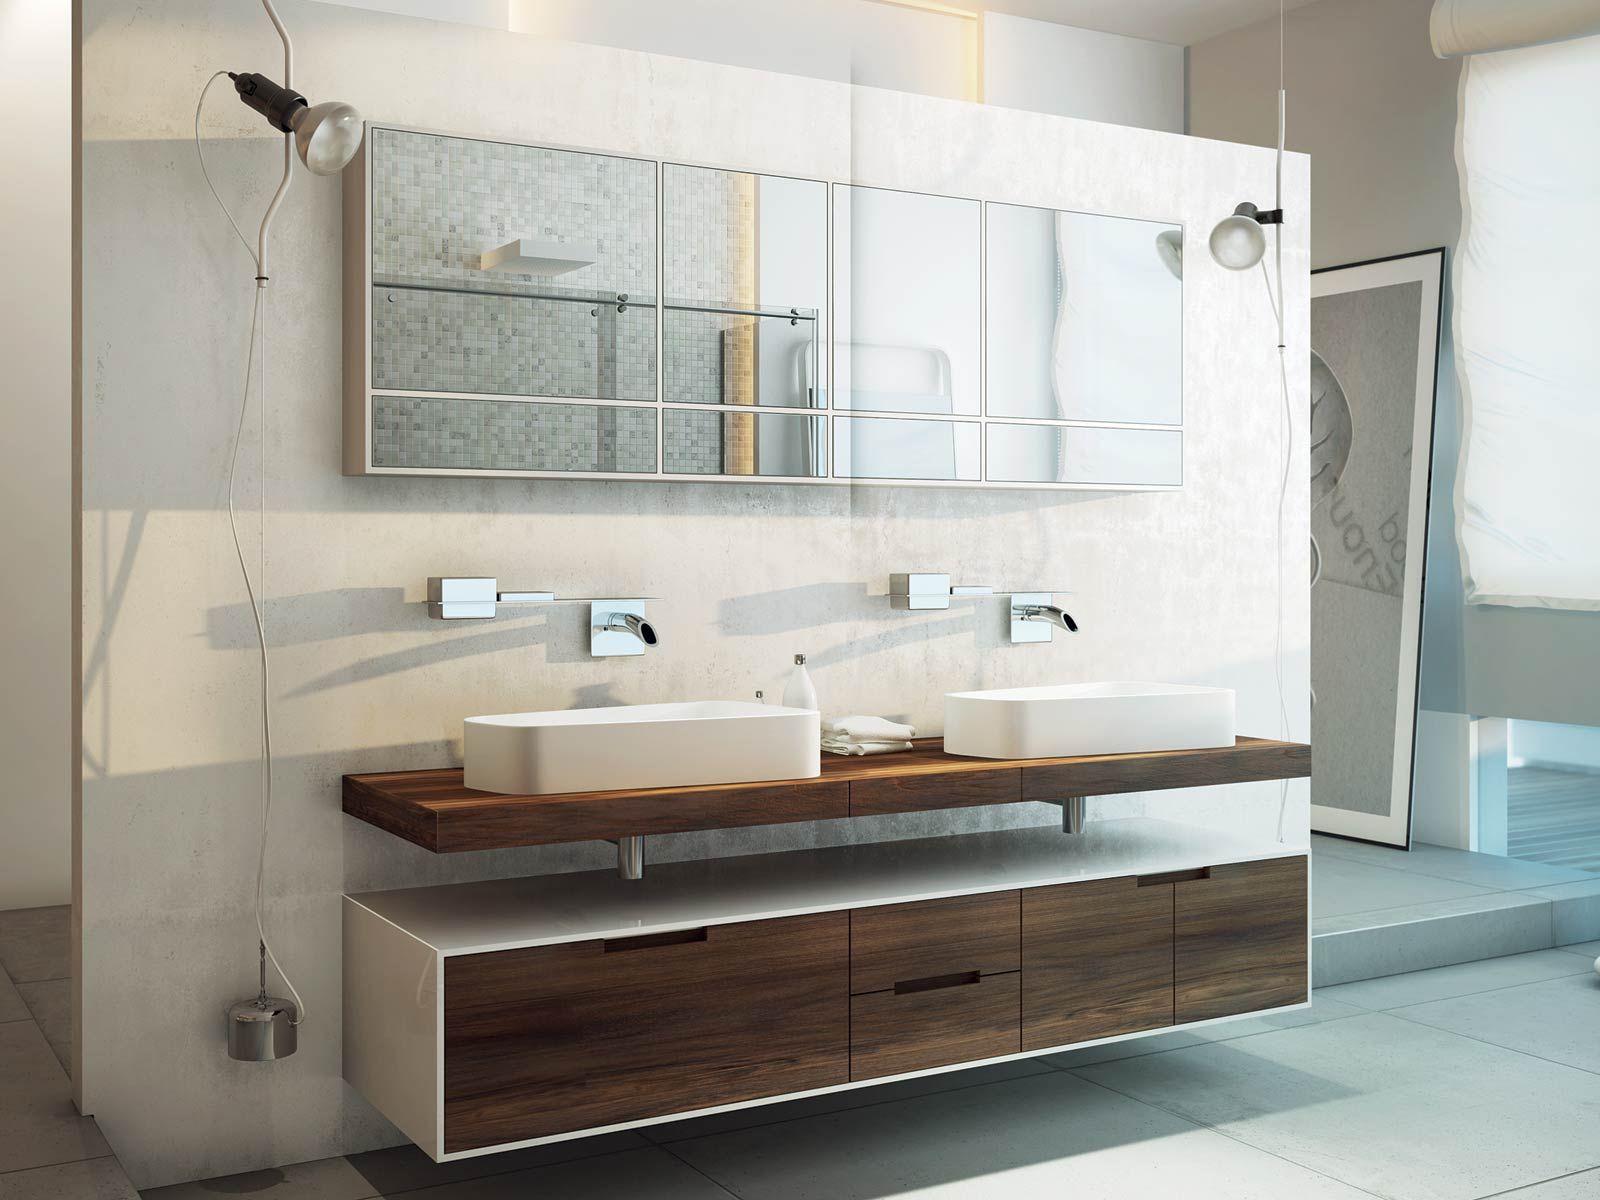 Designer Bathroom Cabinets Inspiration Double Vessel Sink Bathroom Vanities  Google Search  Bathrooms Inspiration Design